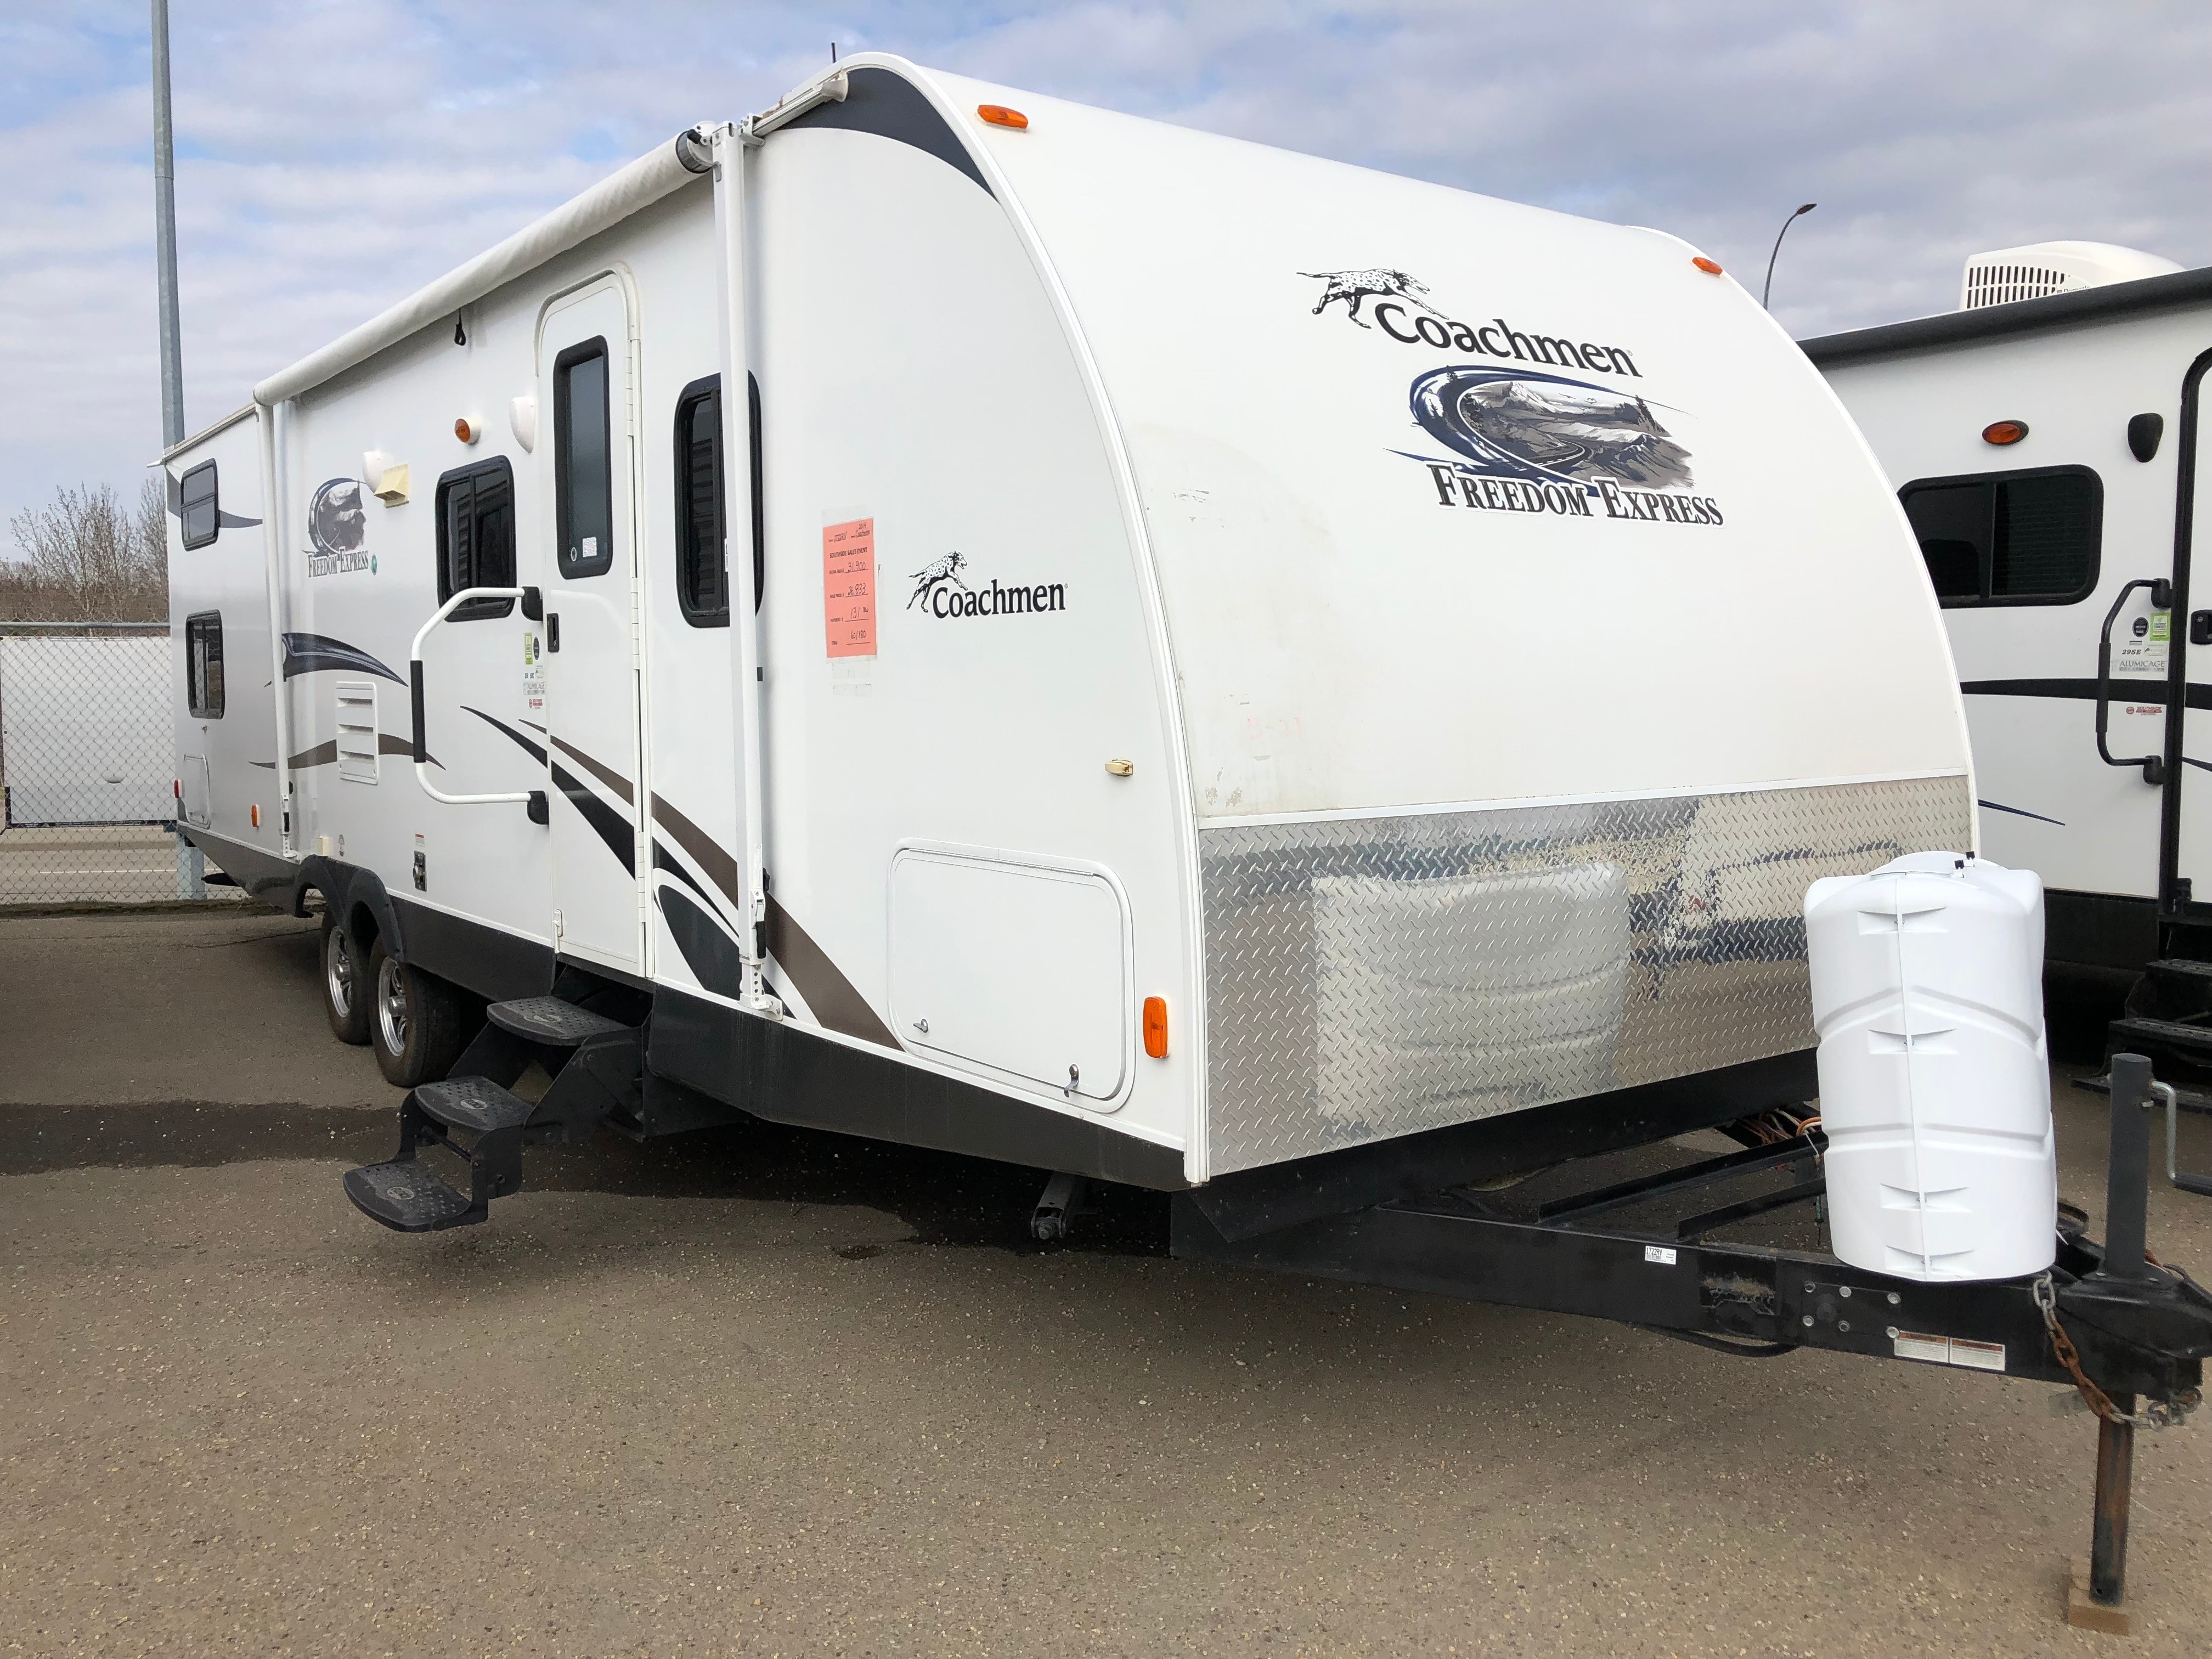 2014 Coachman 29SE TRAVEL TRAILER